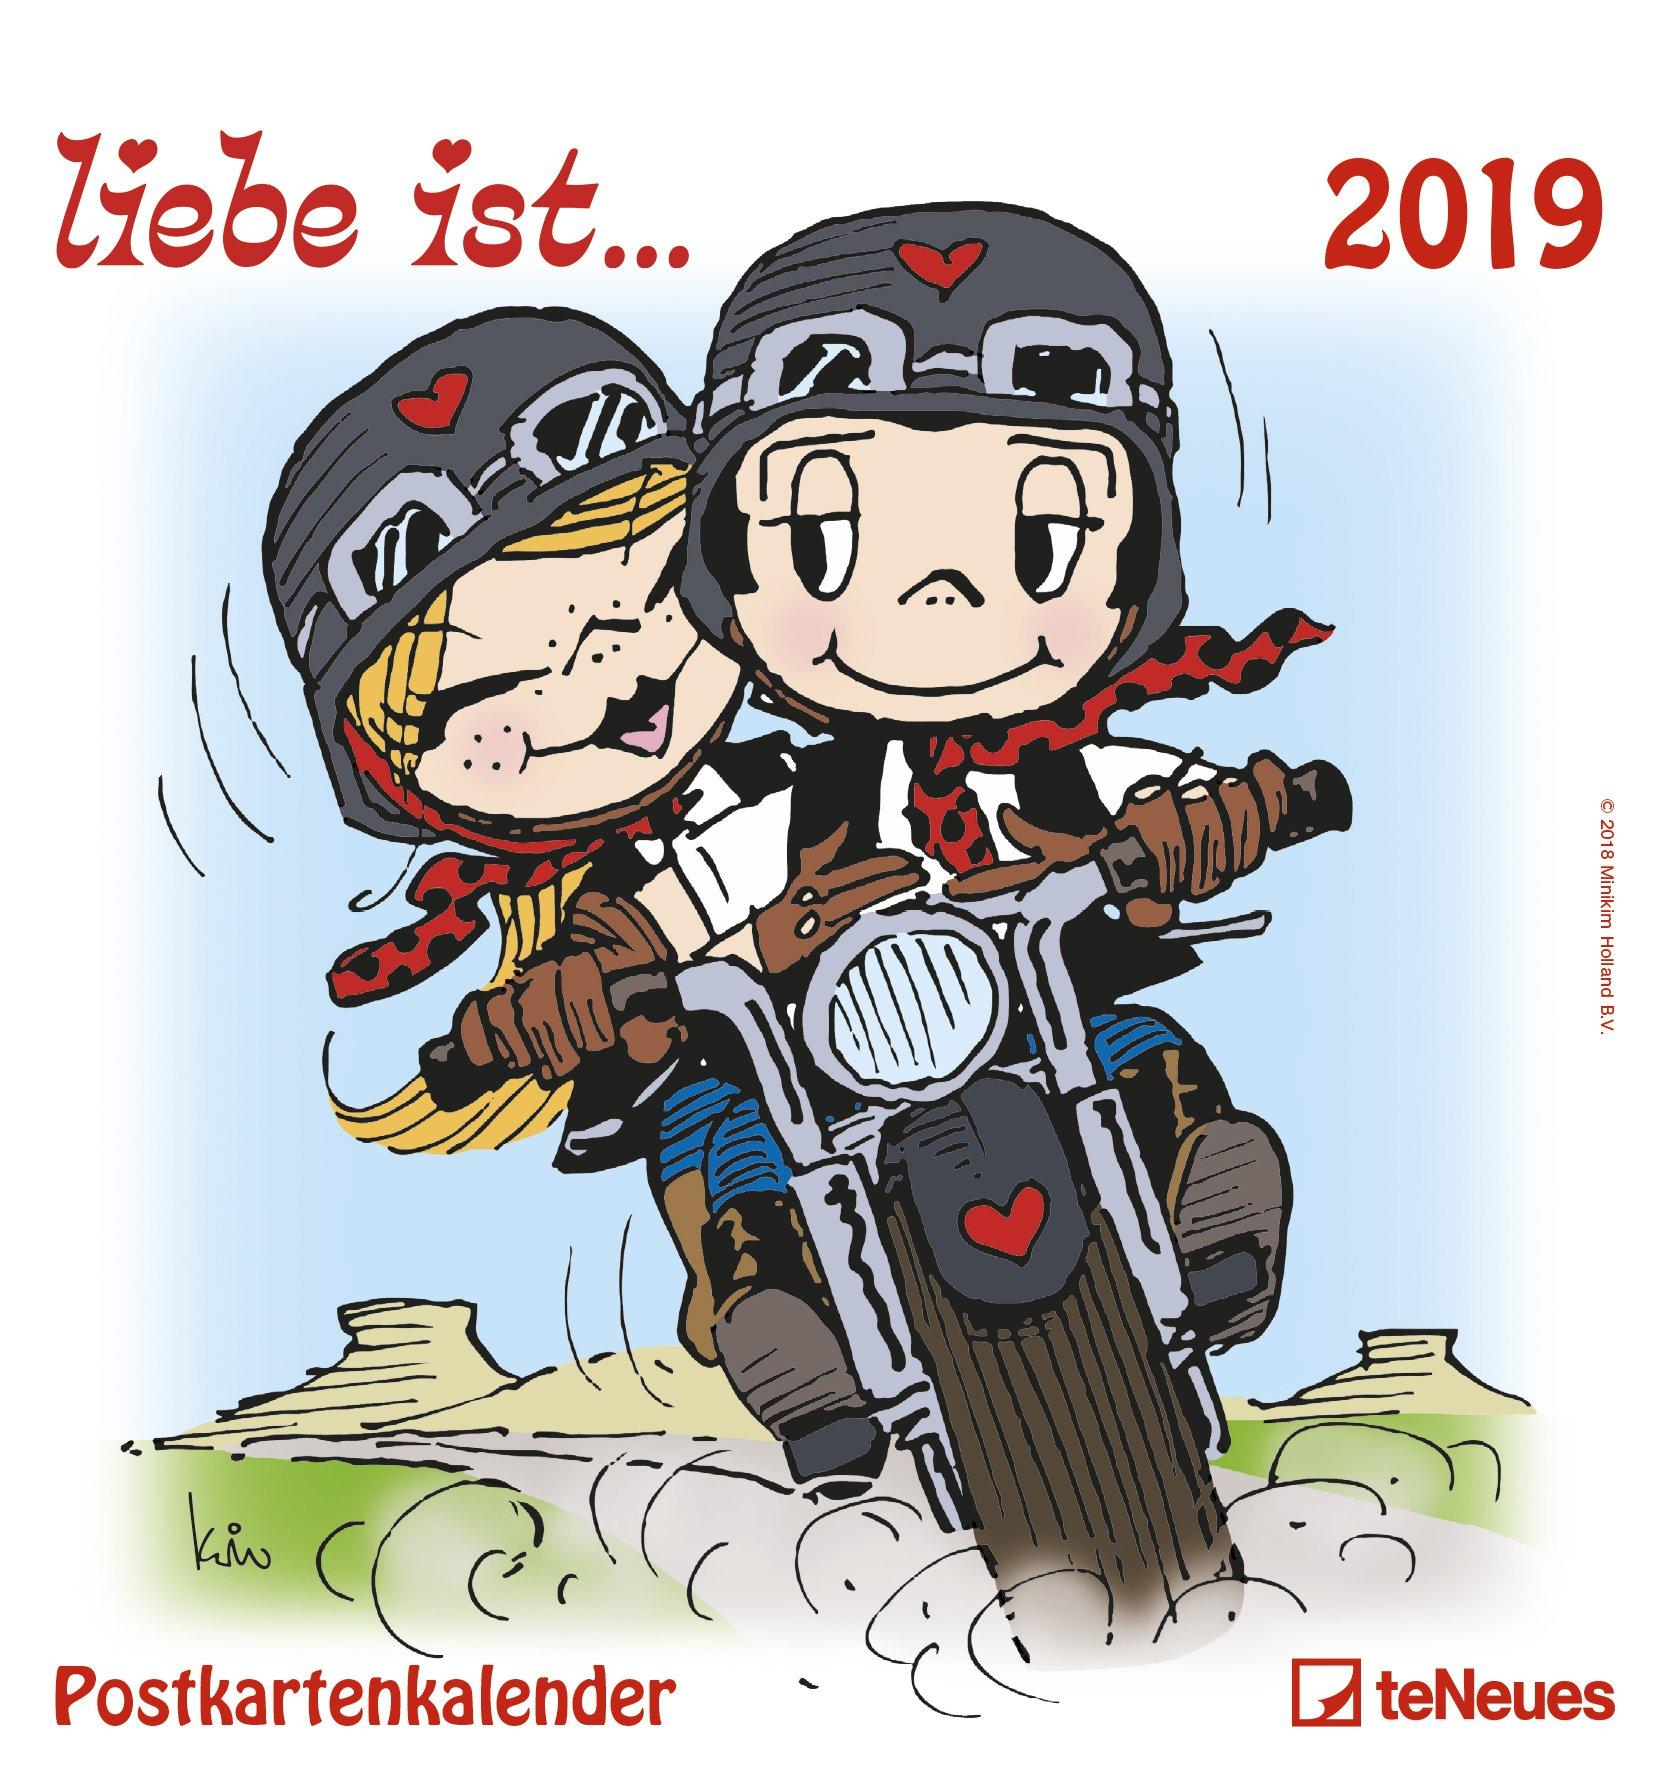 liebe-ist-2019-sprchekalender-wandkalender-postkartenkalender-2019-16-x-17-cm